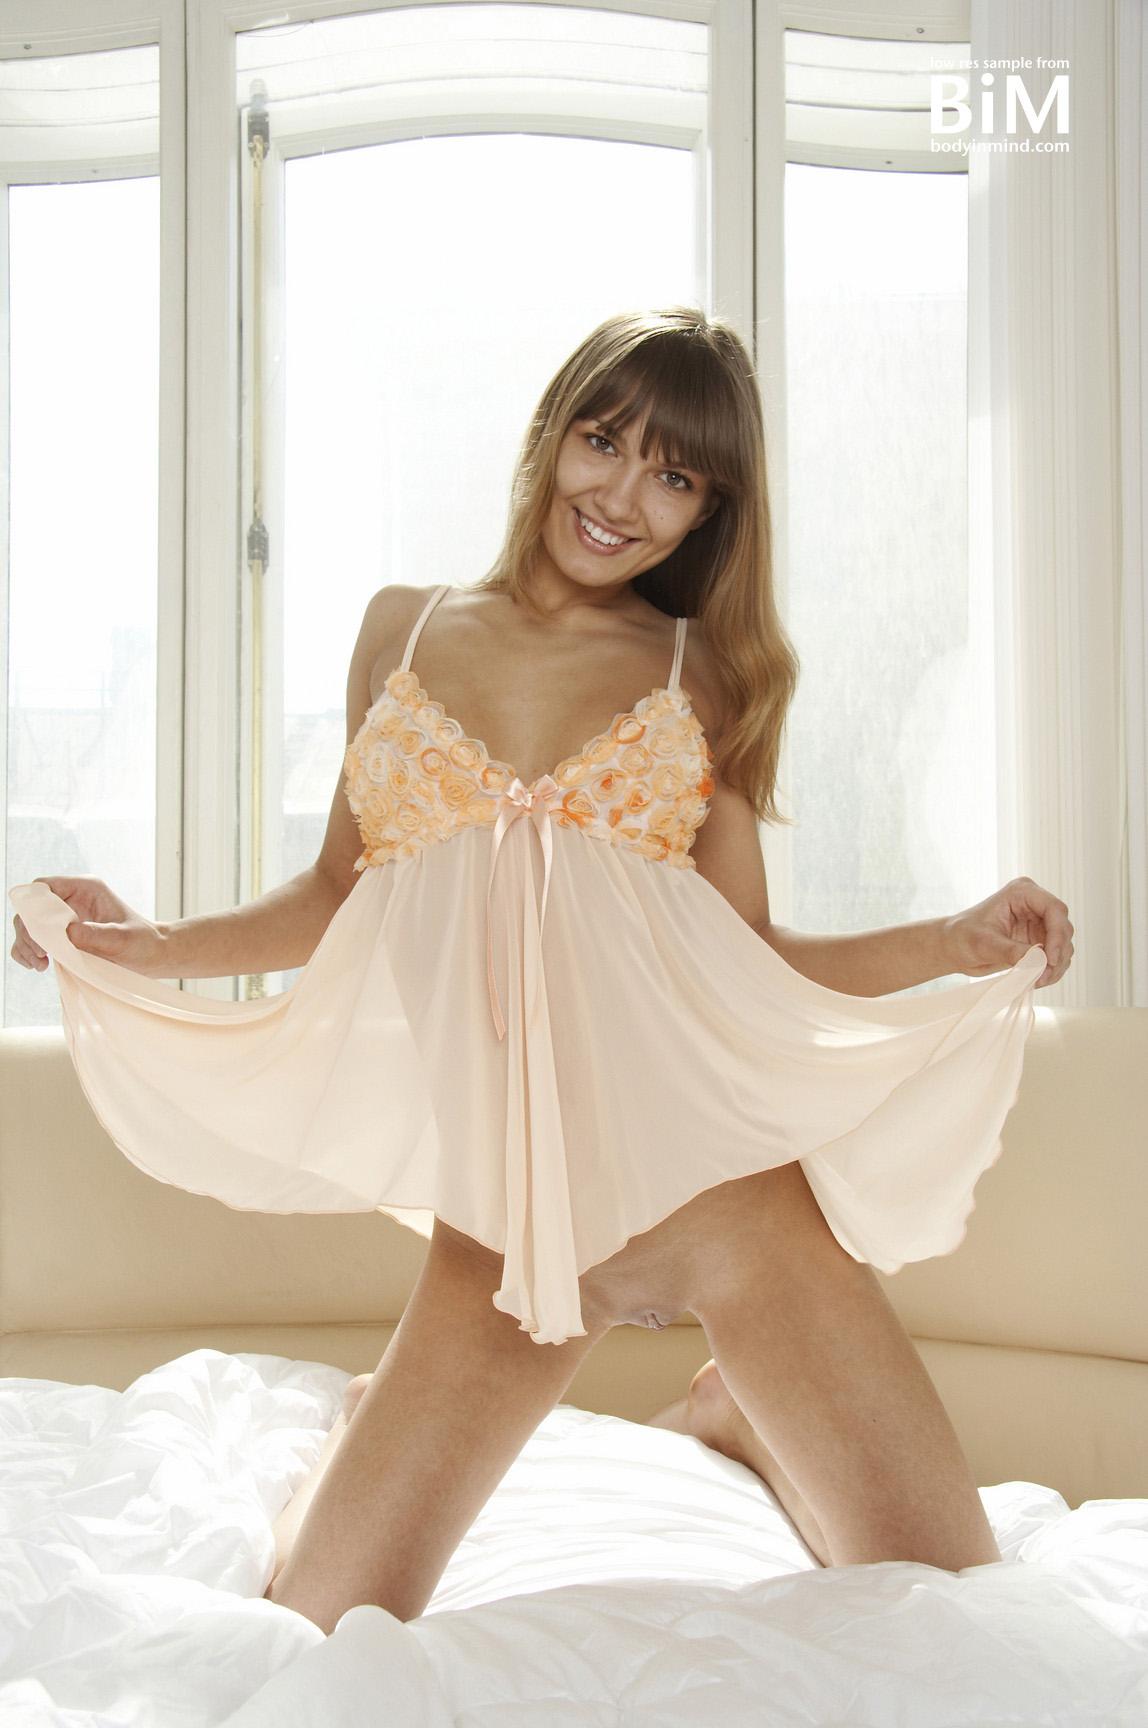 Athena Big Boobs Peach Seethrough Nightie for Body in Mind